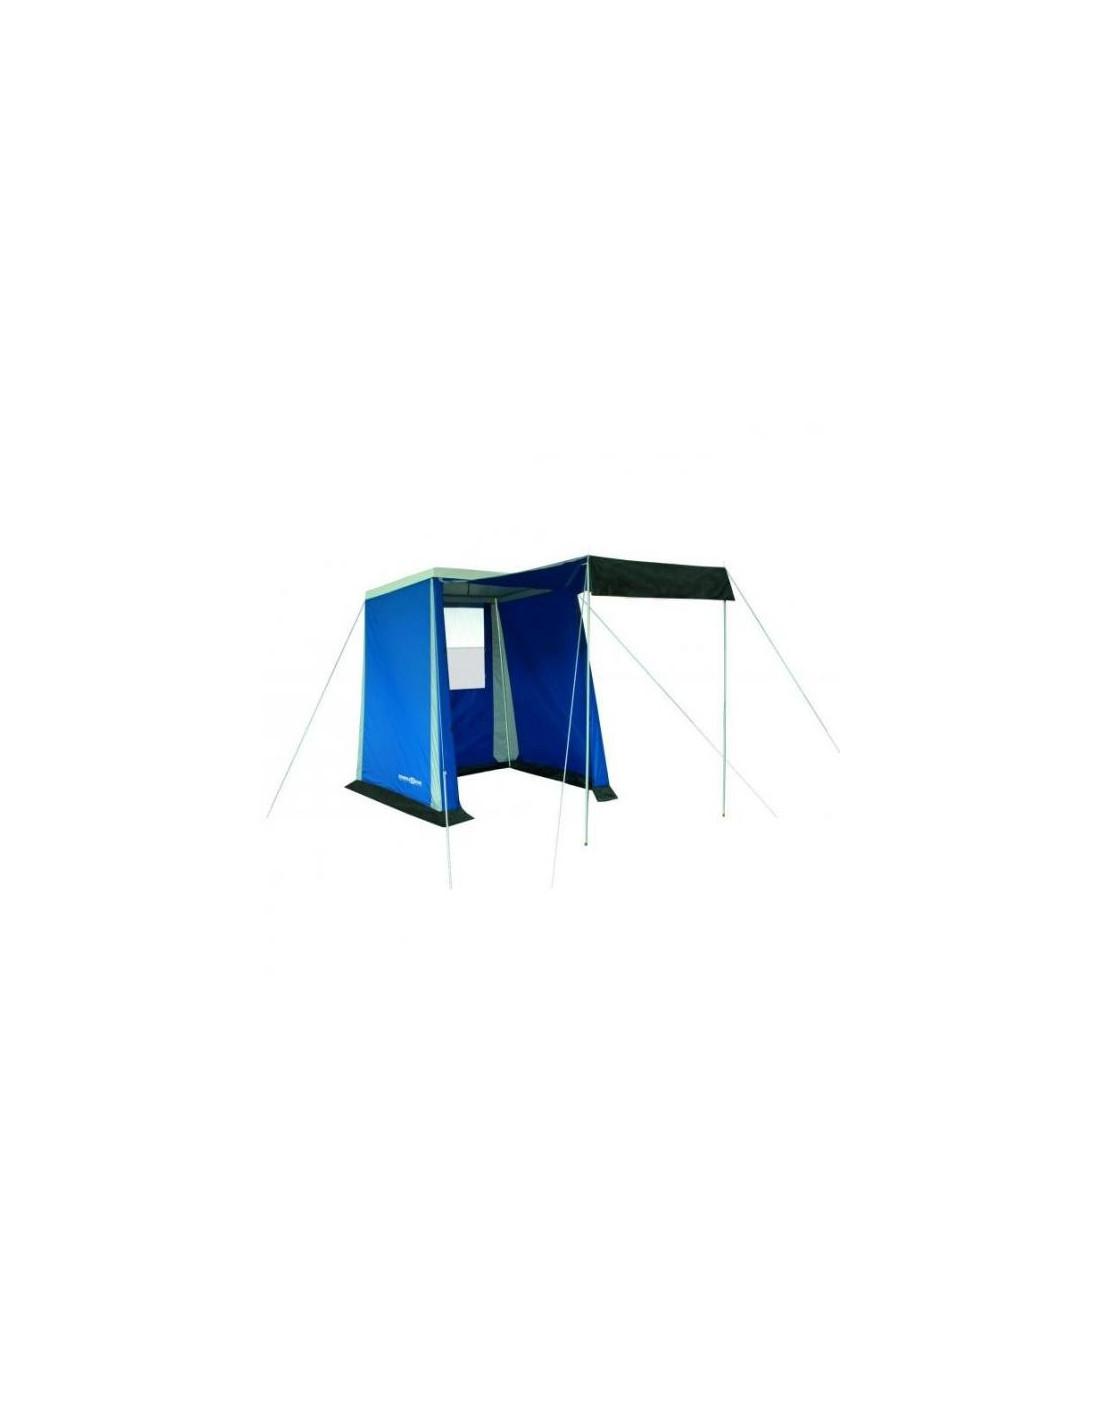 f08b1dbc68b Tienda cocina camping CookHouse Brunner | Tienda de Camping online